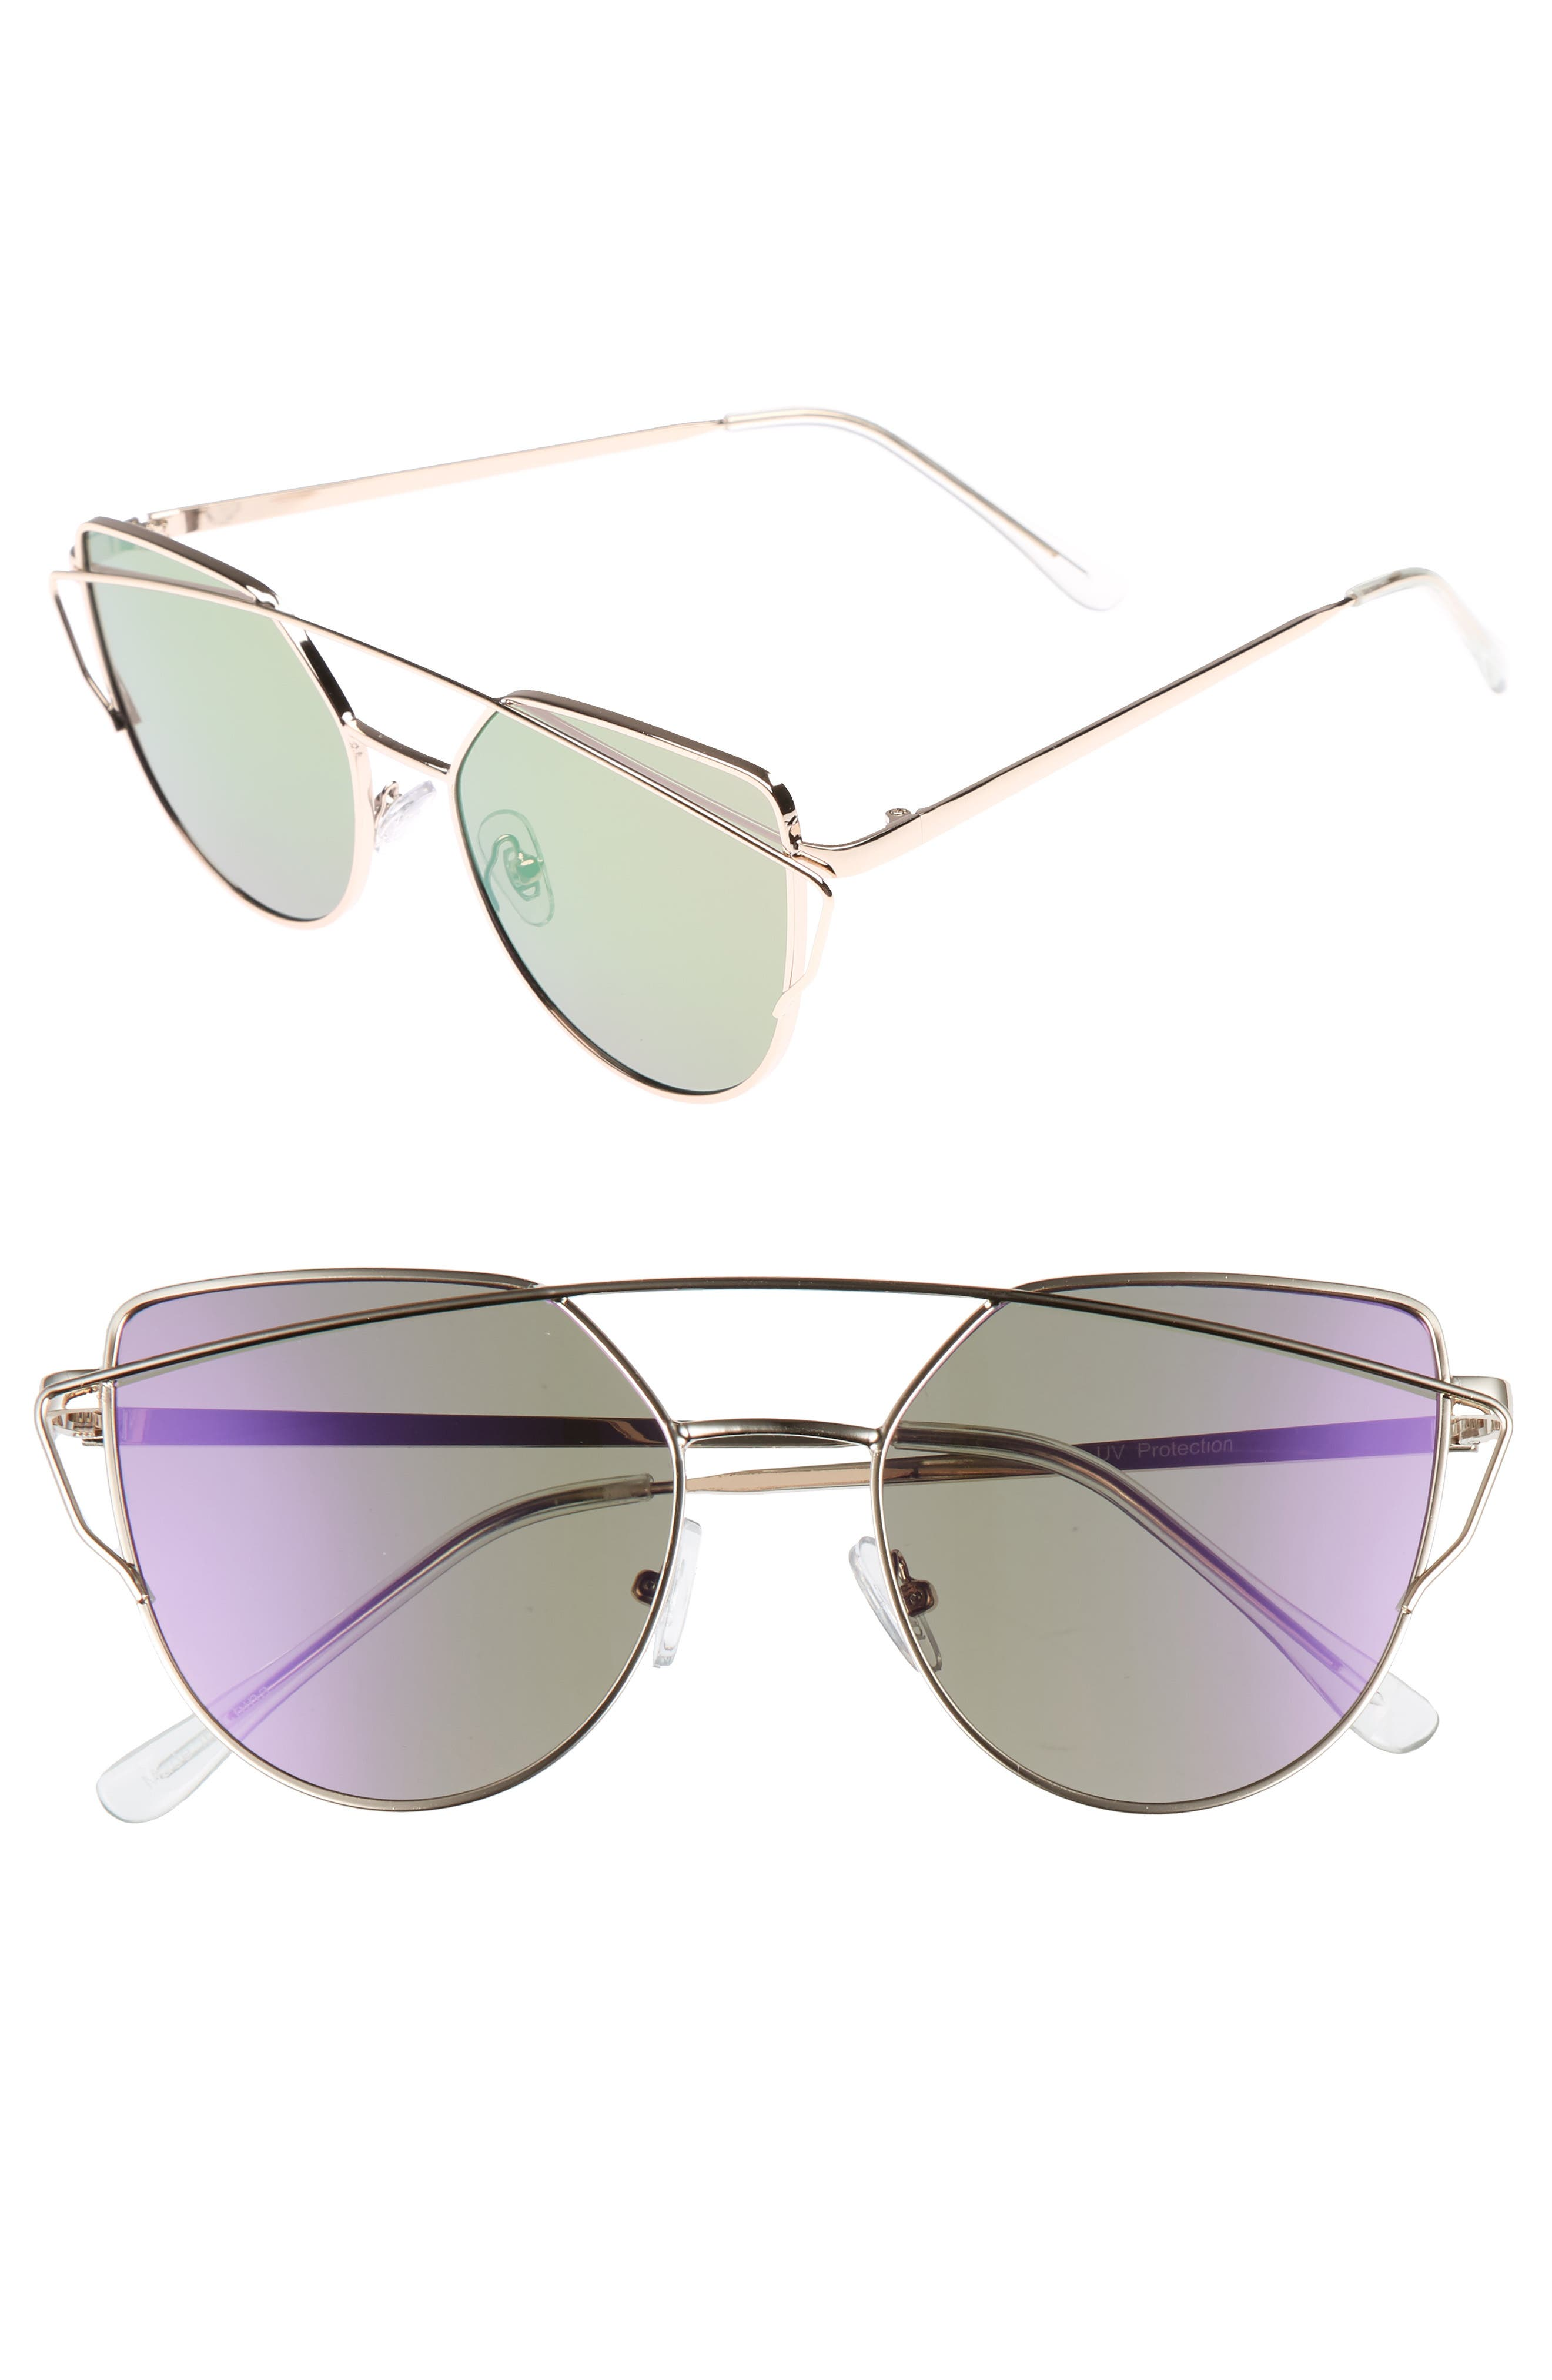 52mm Thin Brow Angular Aviator Sunglasses,                         Main,                         color, Gold/ Purple